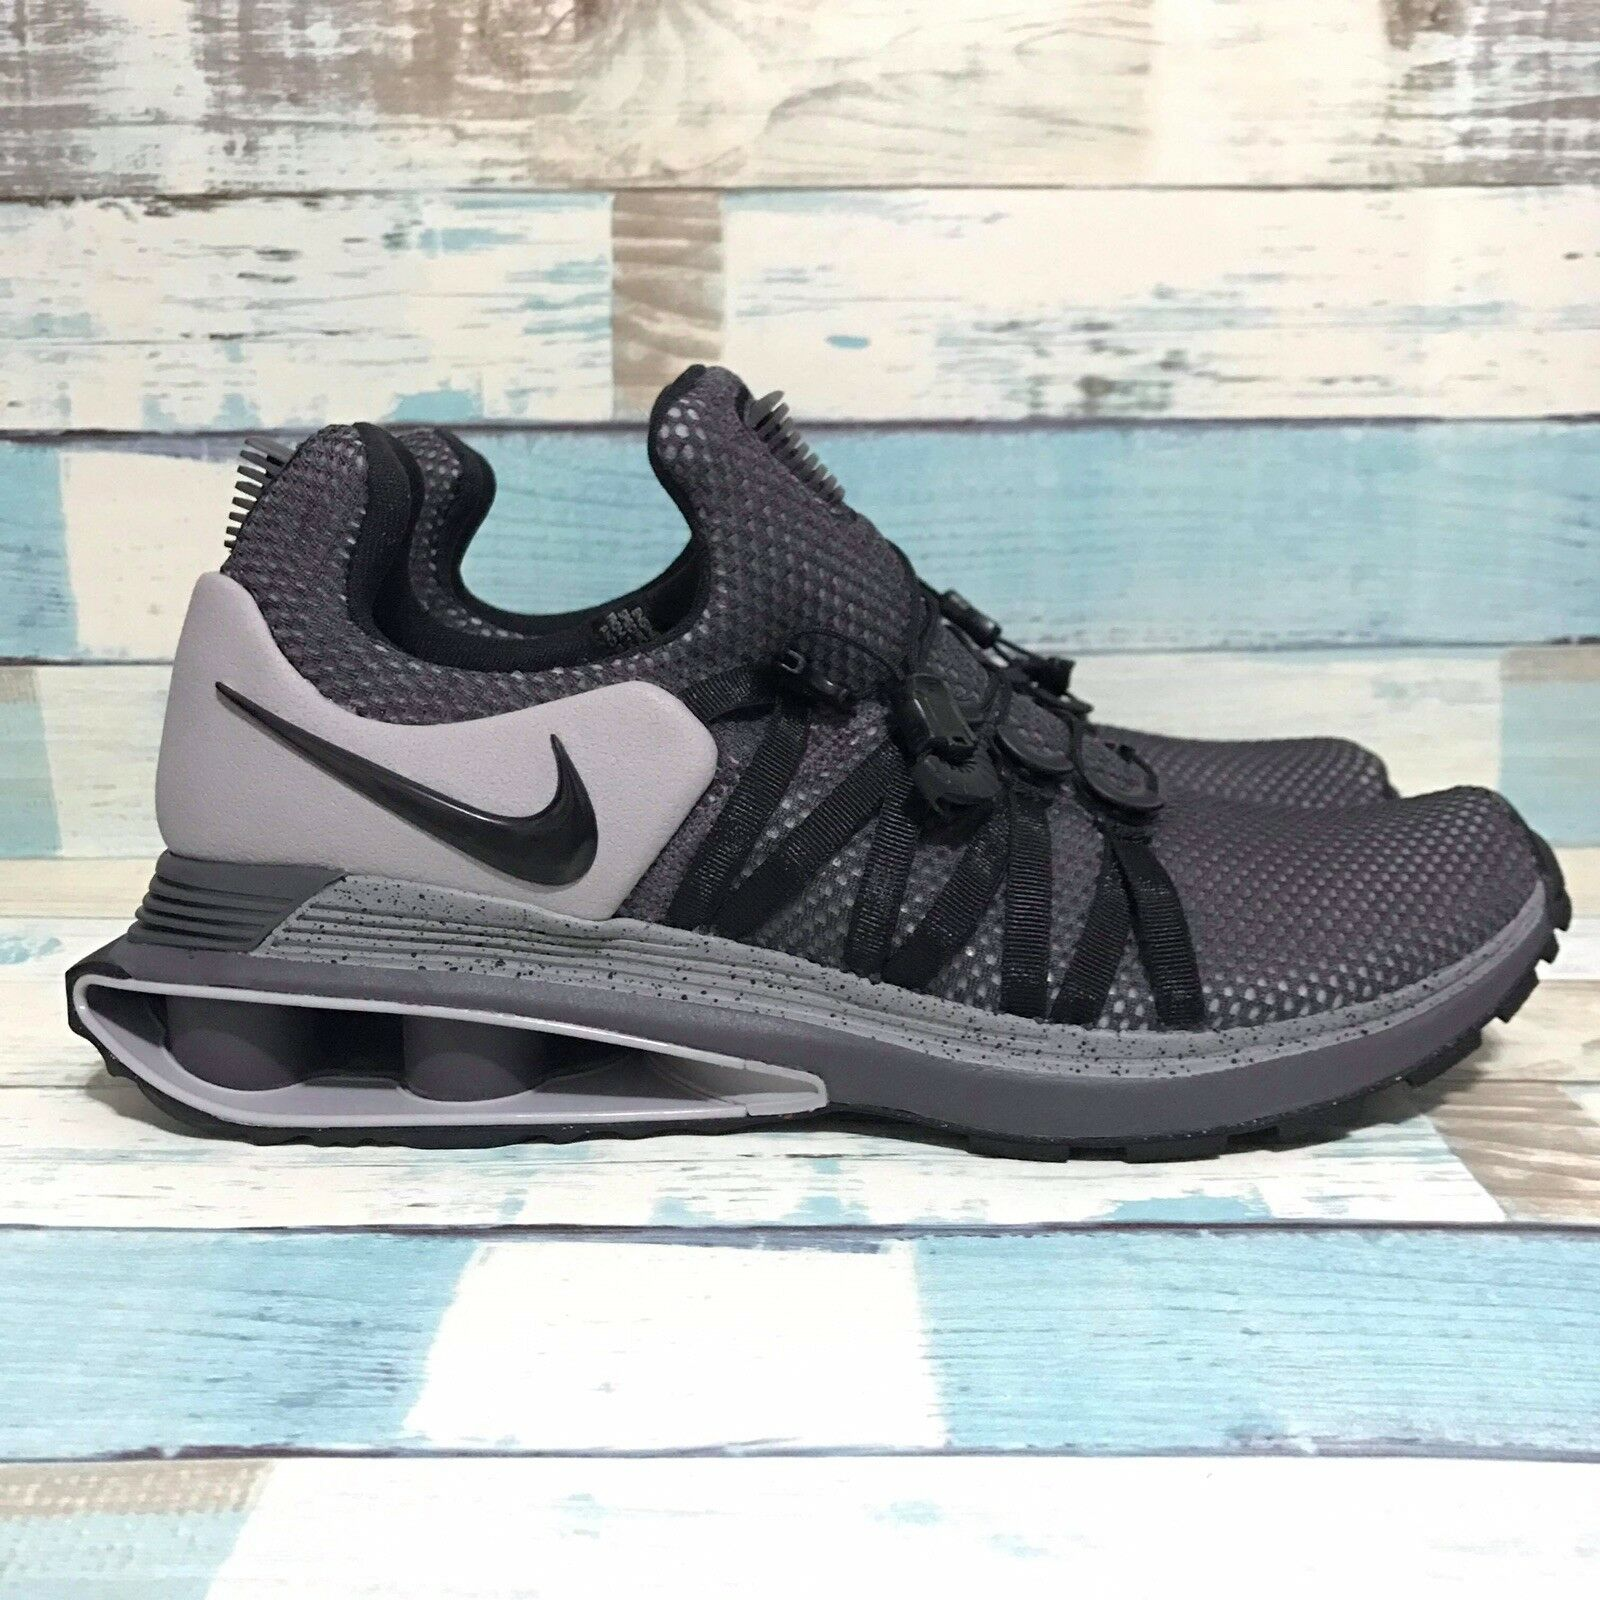 reputable site b85c9 eddec Nike kyrie 4 iv scarpe ...